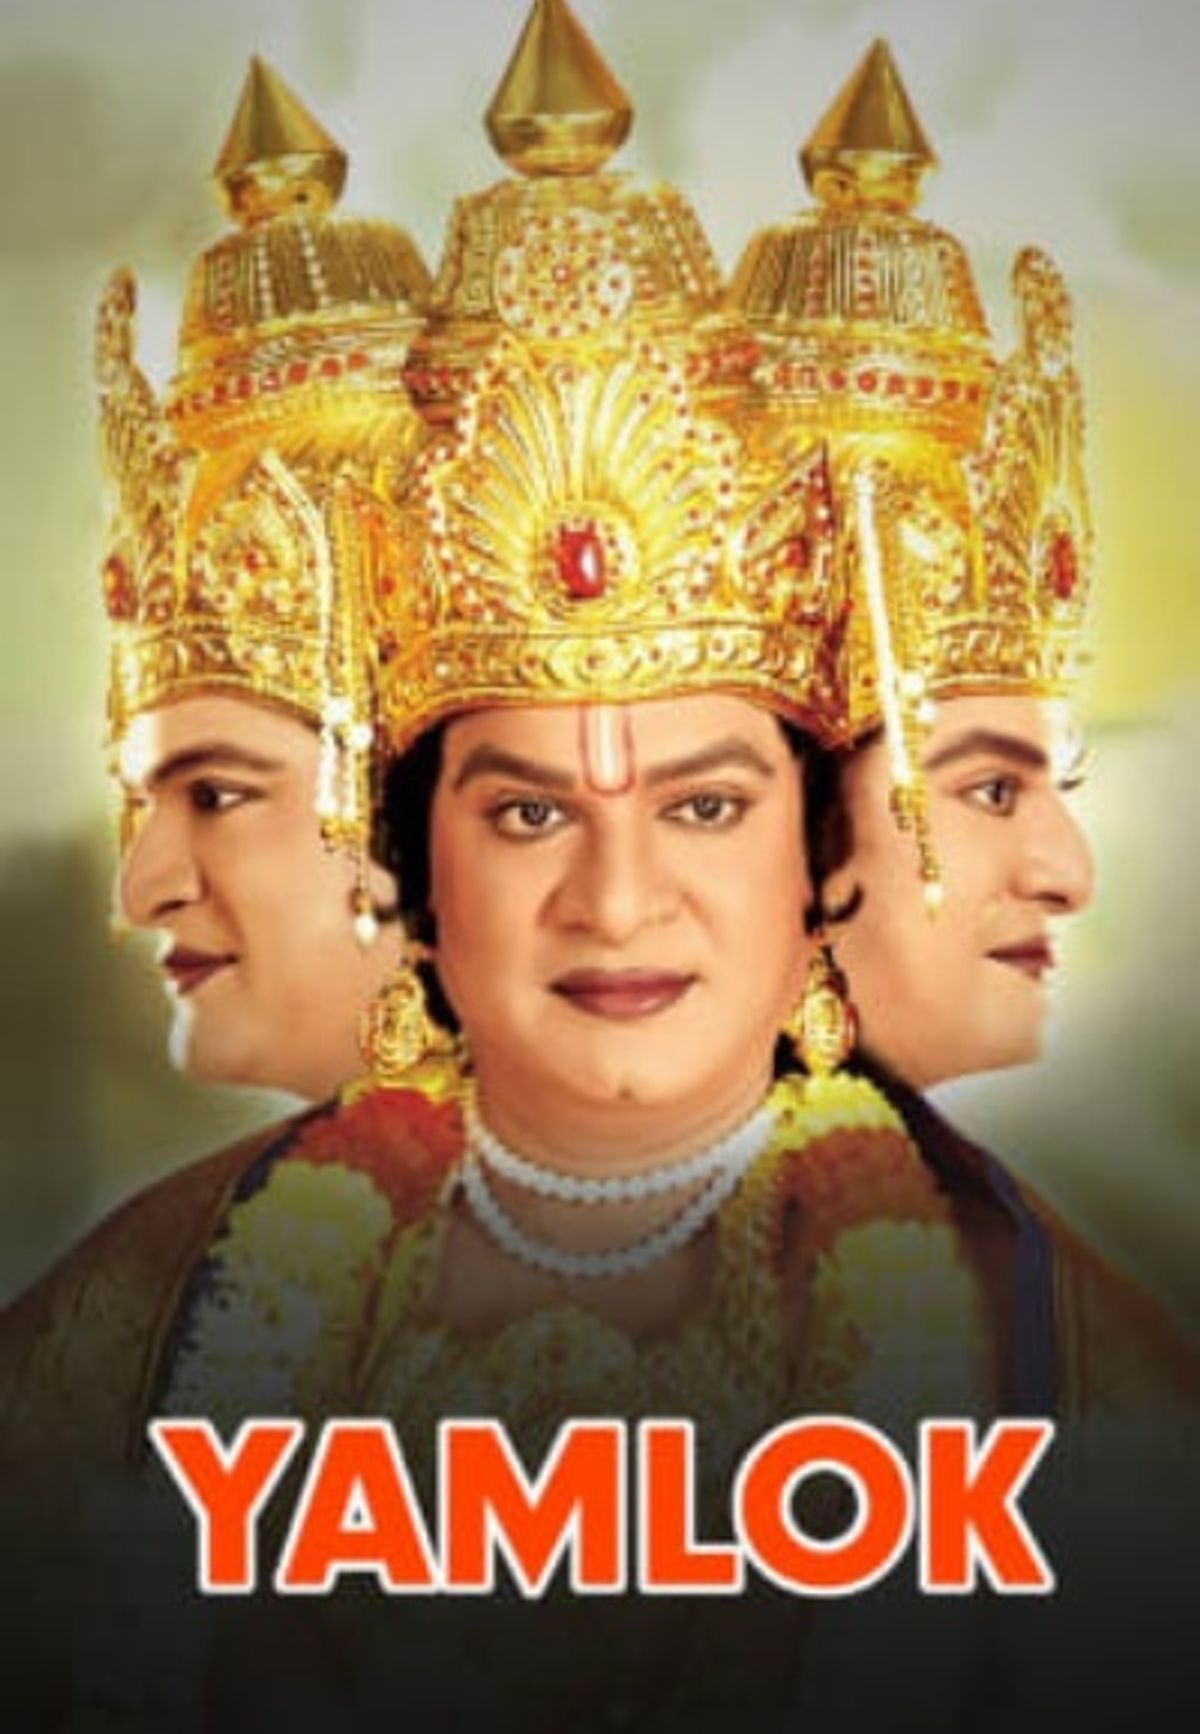 Yamlok